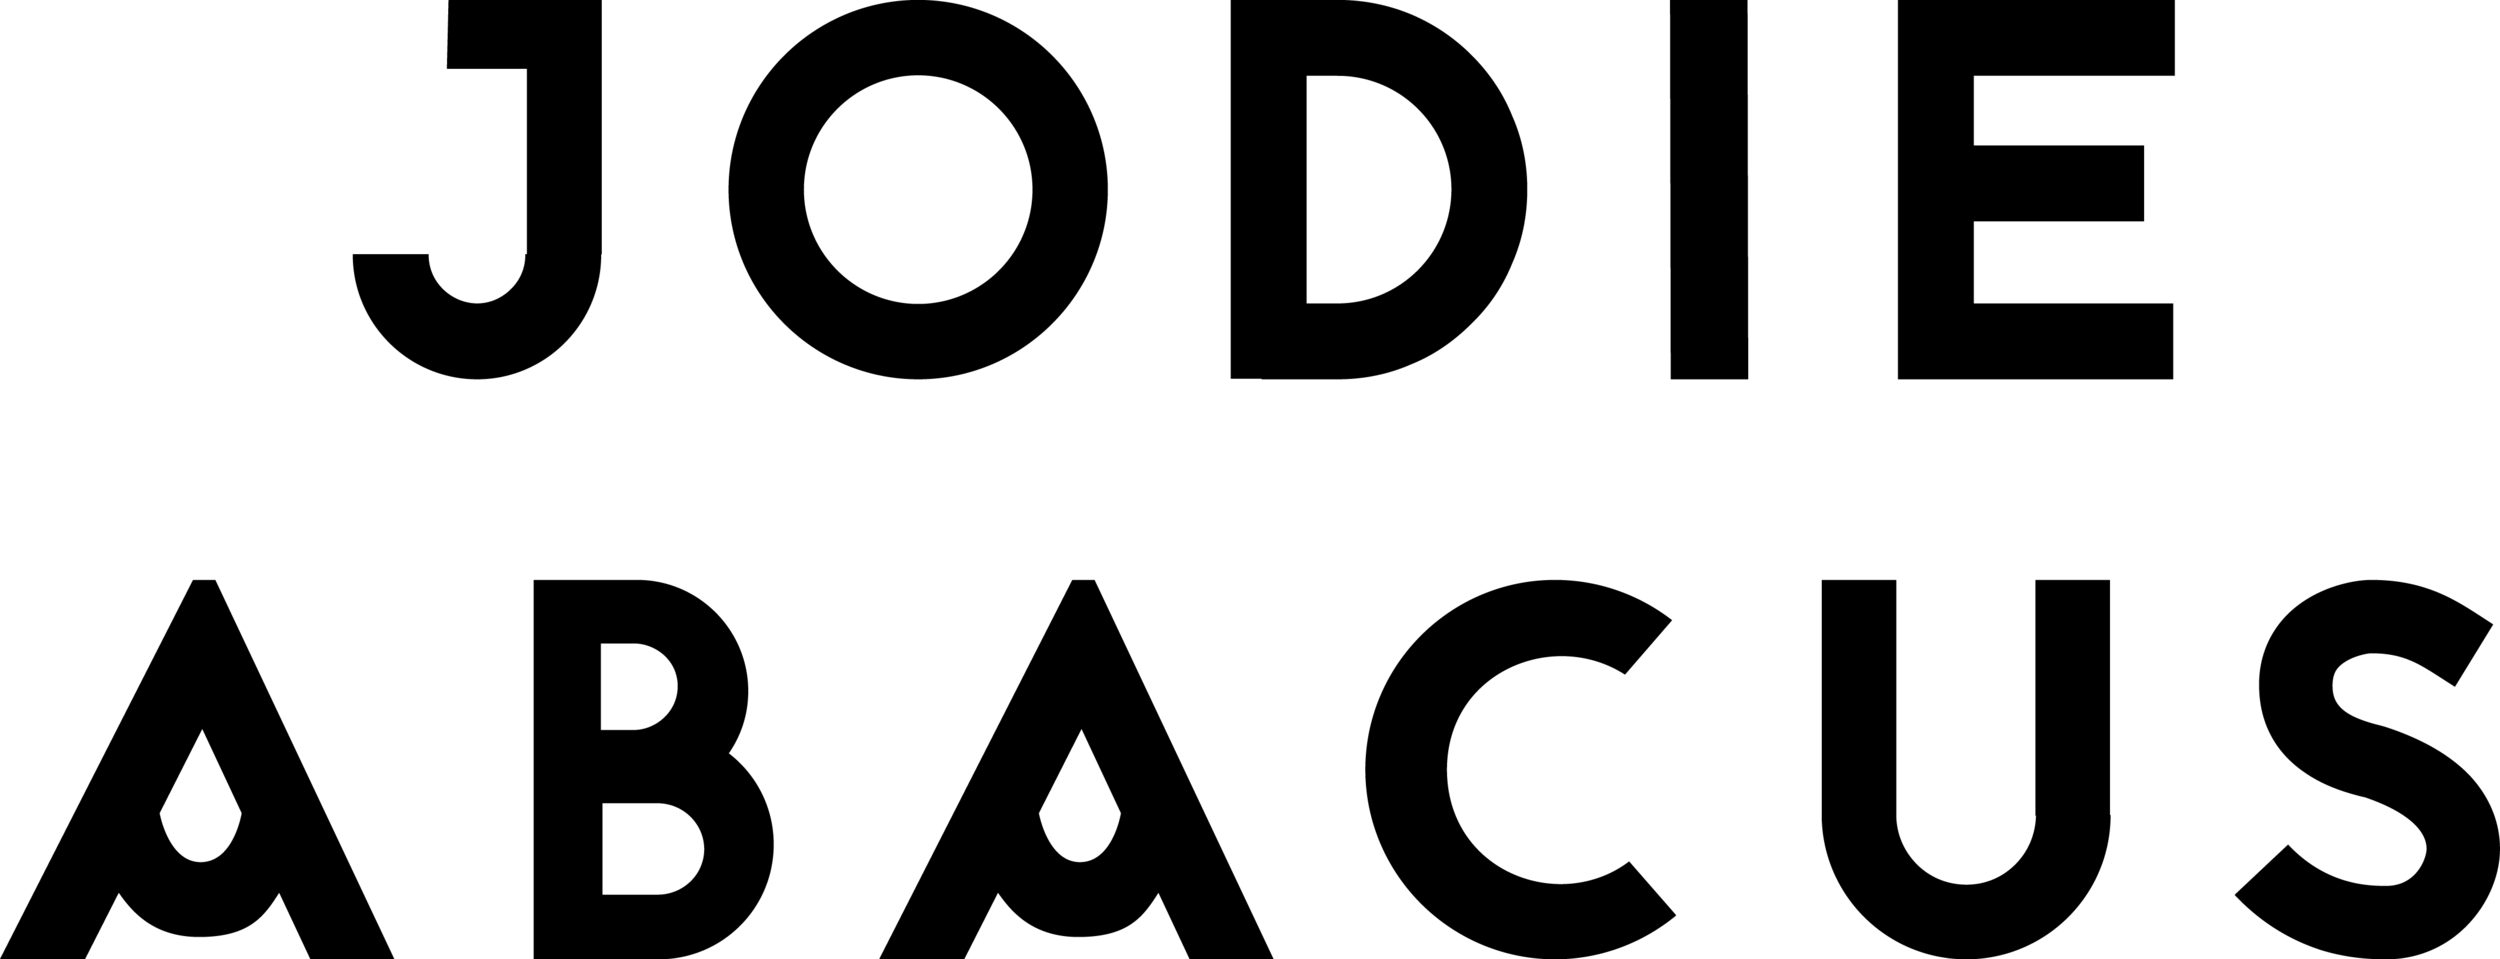 Ferocious Talent Jodie Abacus Logo.png